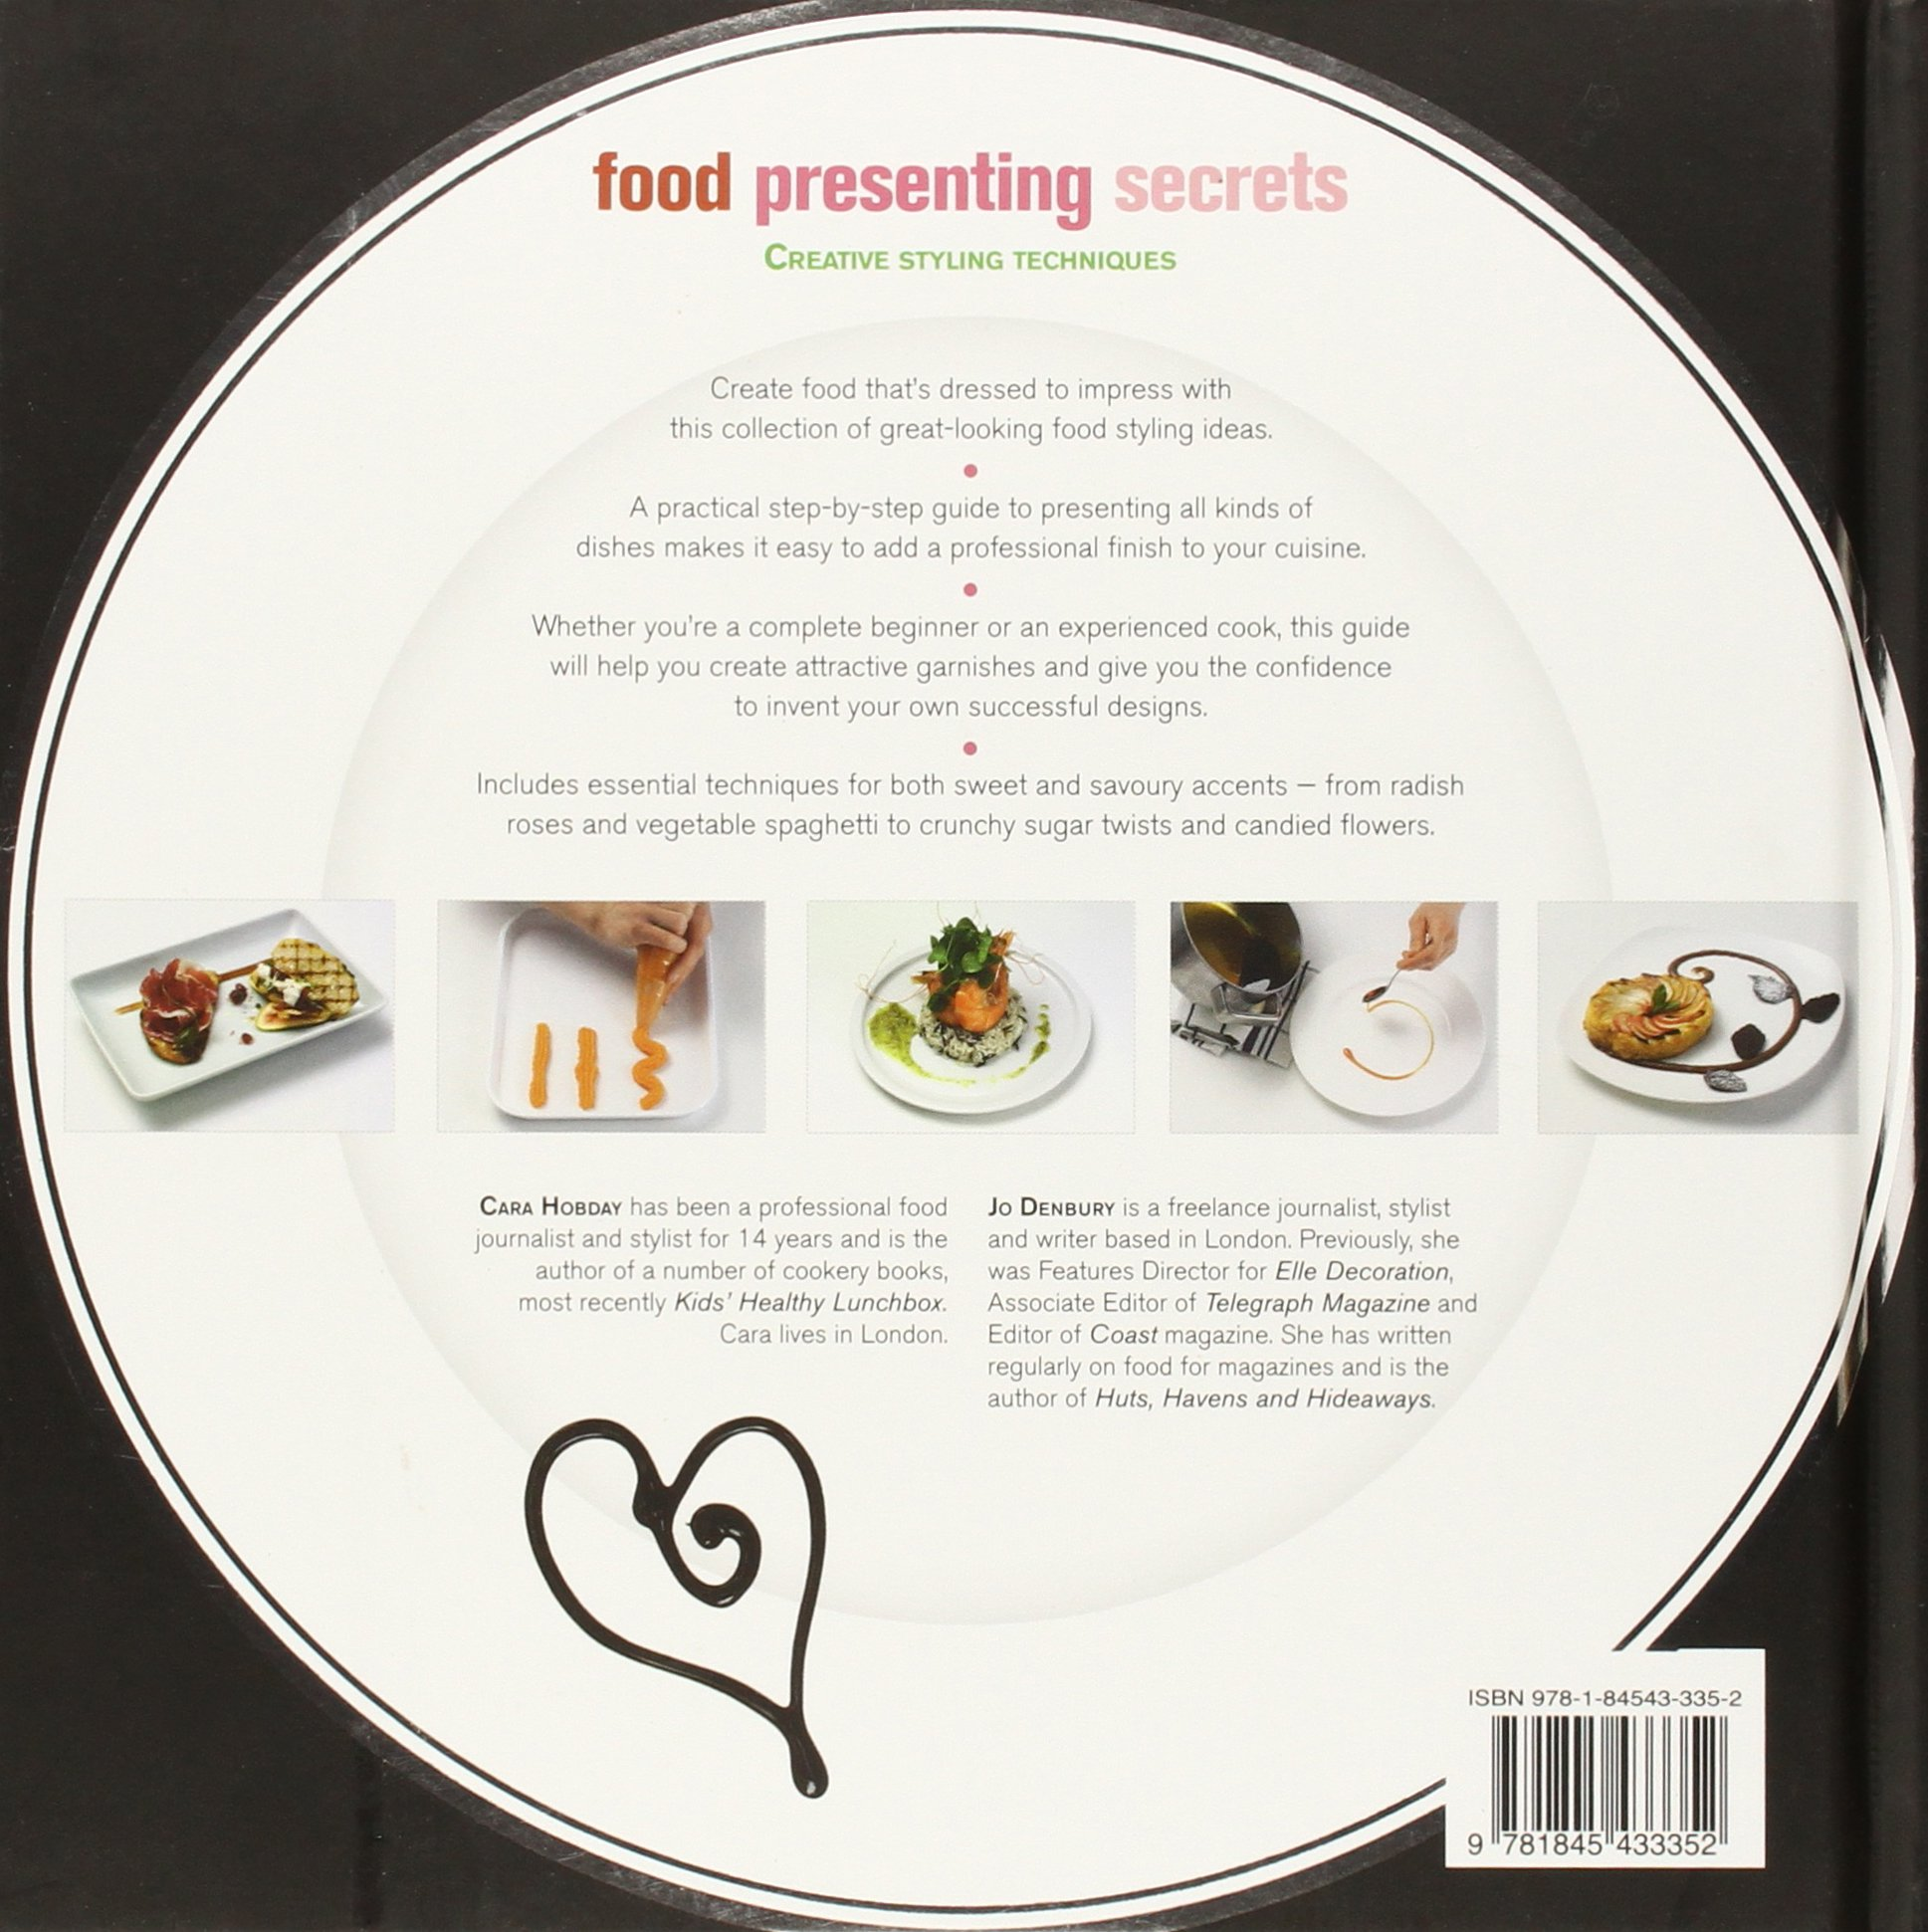 Food presenting secrets jo denbury 8601404455919 amazon books fandeluxe Image collections